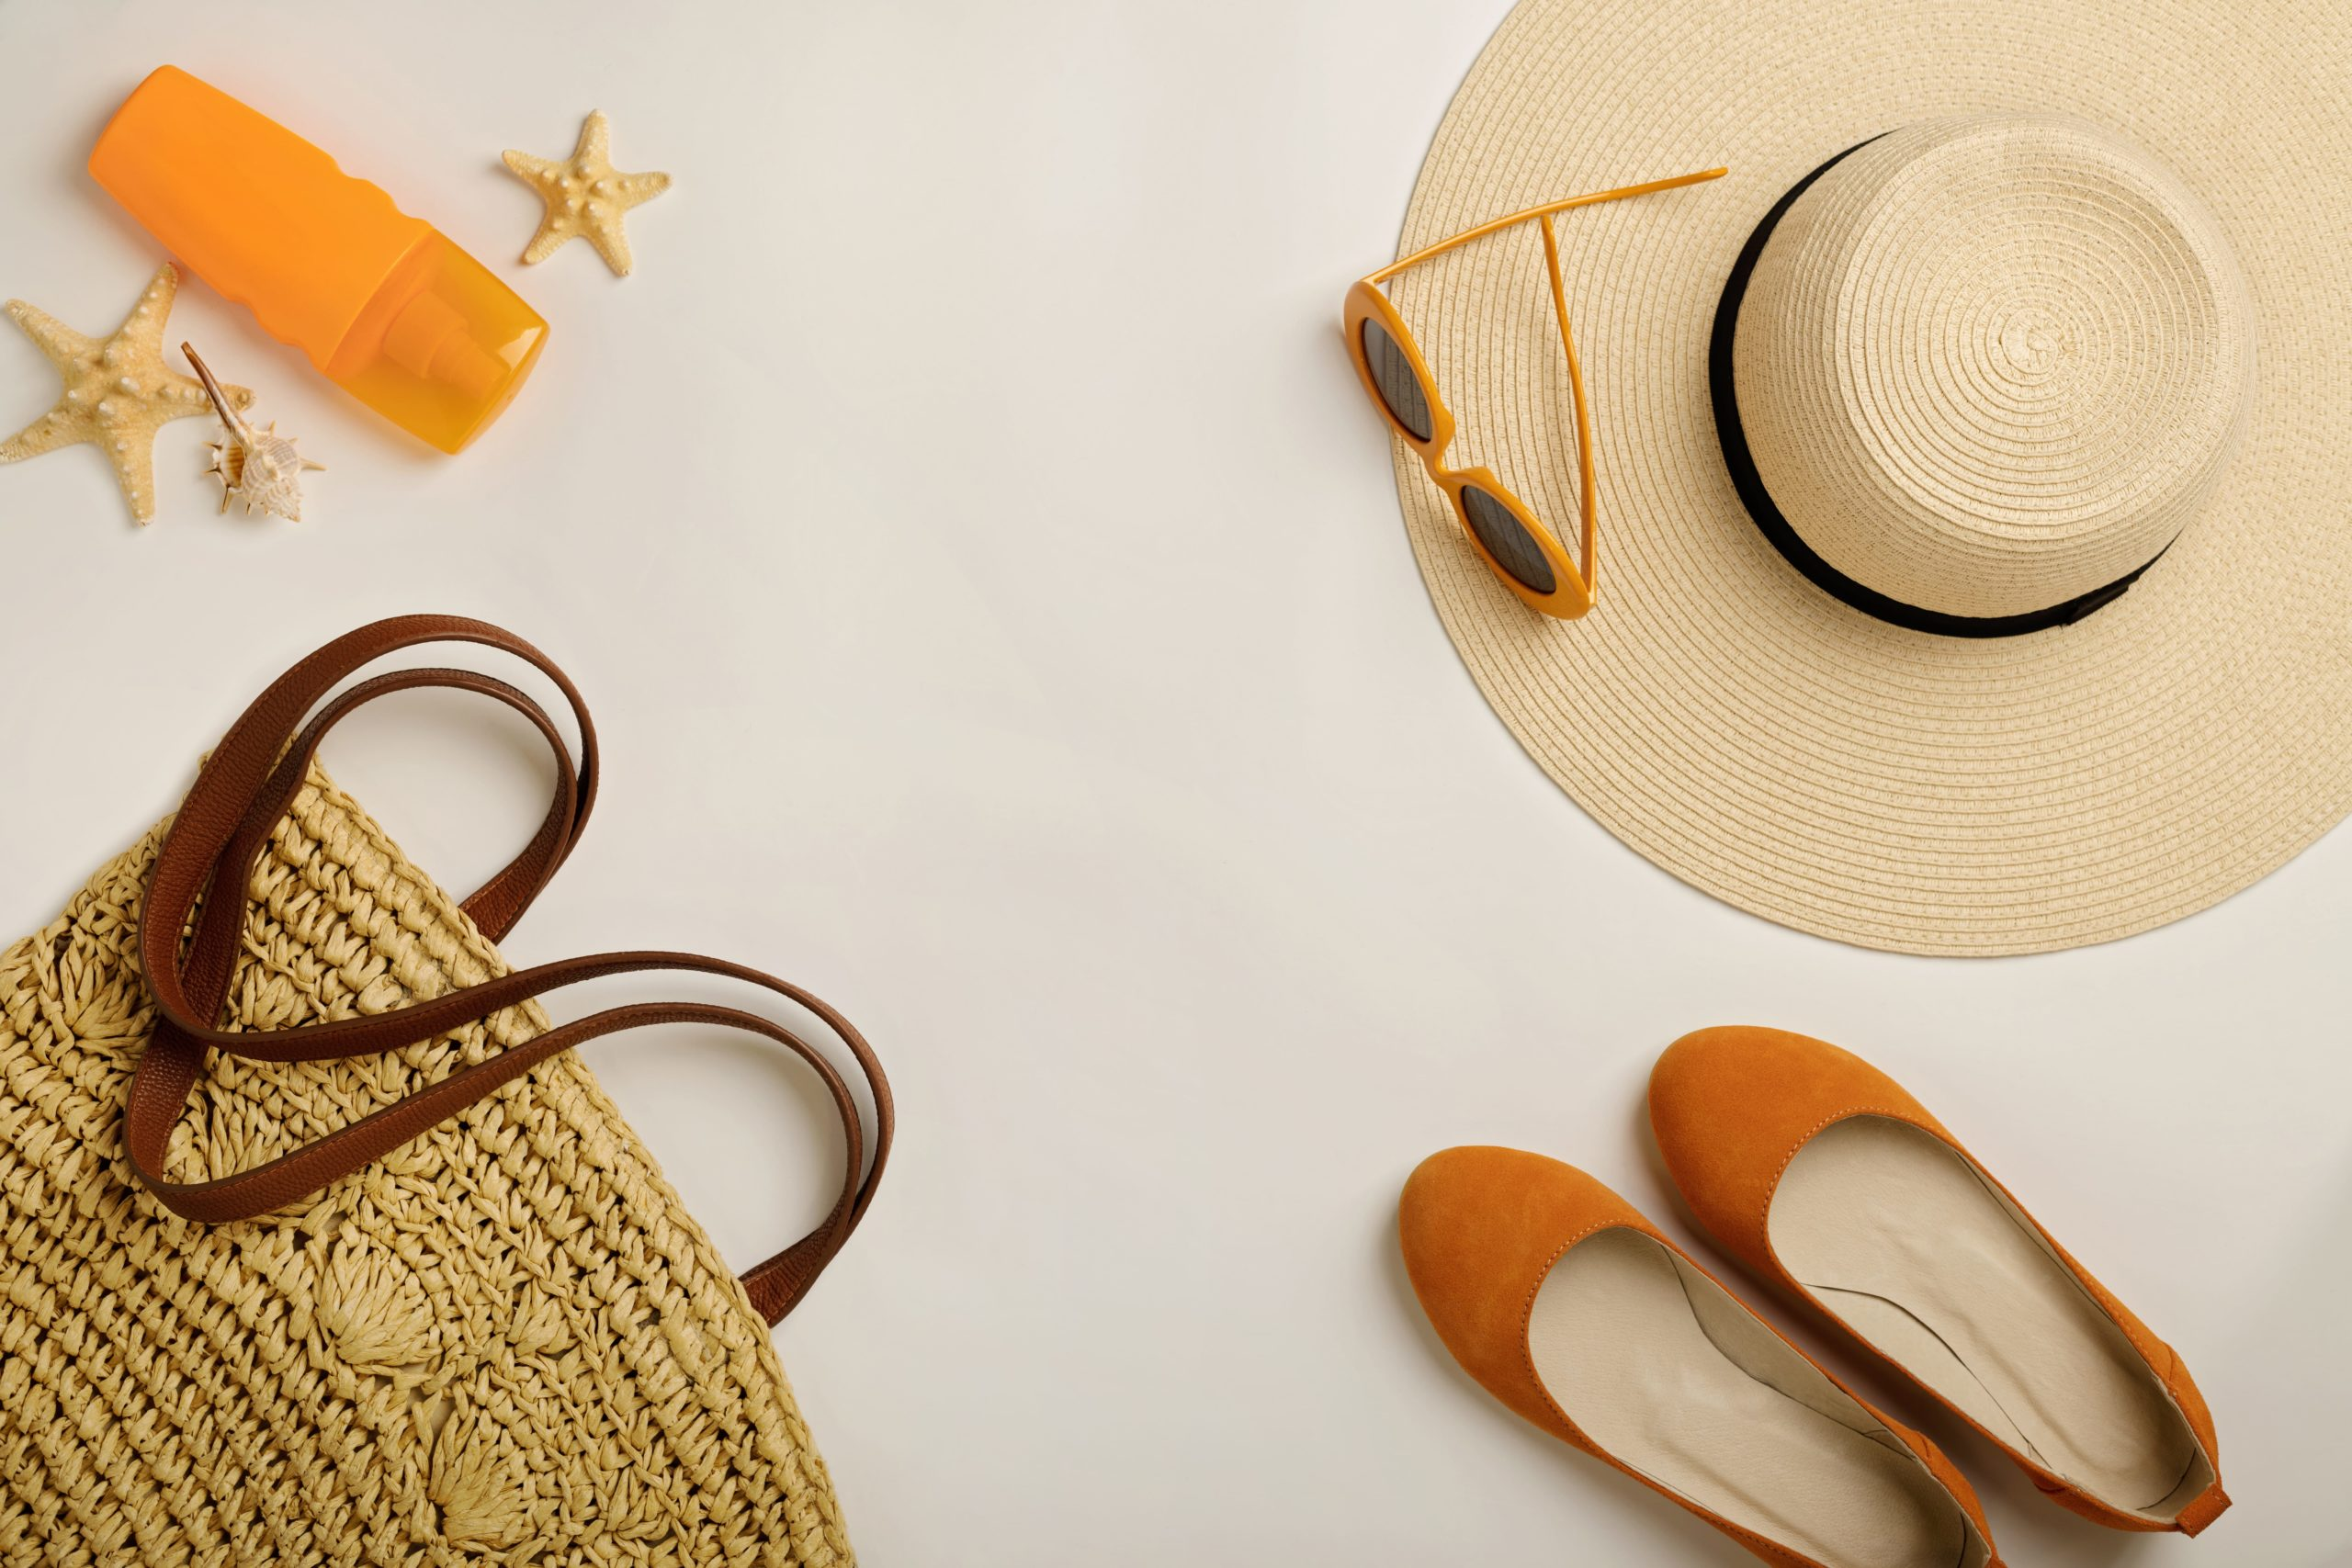 Солнце, солнцезащитные средства, загар, защита от солнца, пляж, солнечный ожег